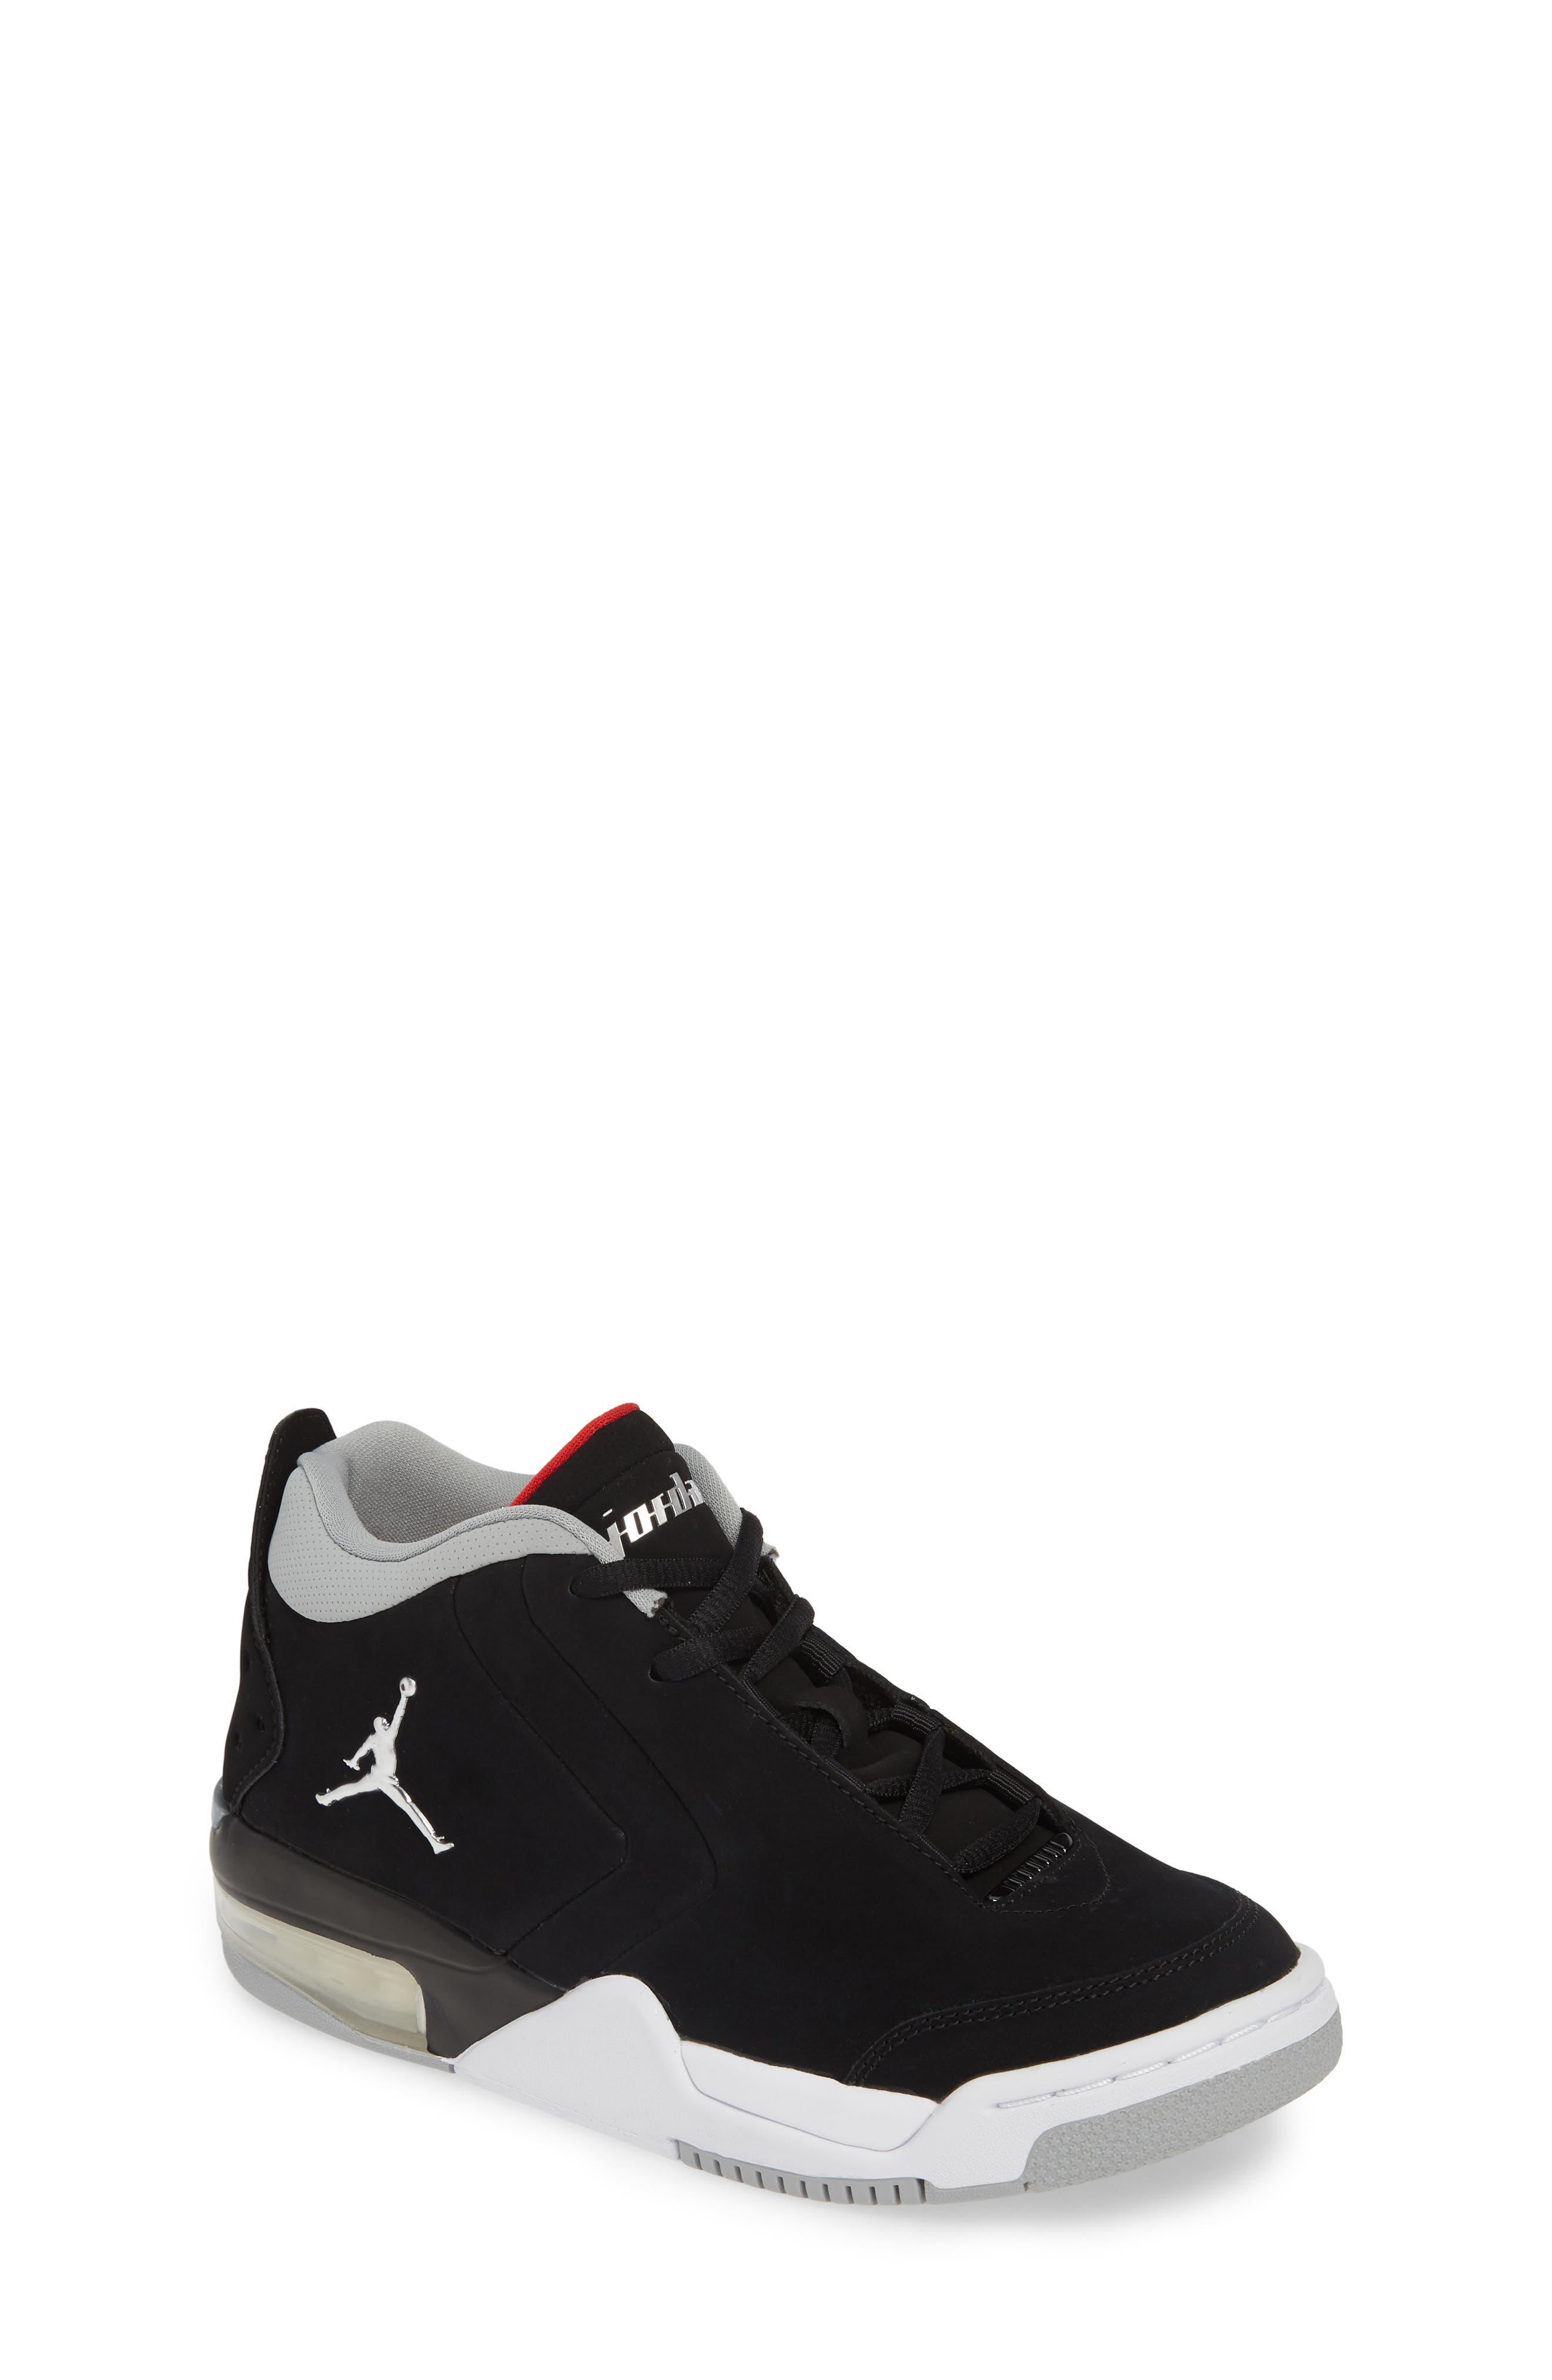 JORDAN Big Fund Mid Top Basketball Sneaker, Main, color, BLACK/ METALLIC SILVER-WHITE